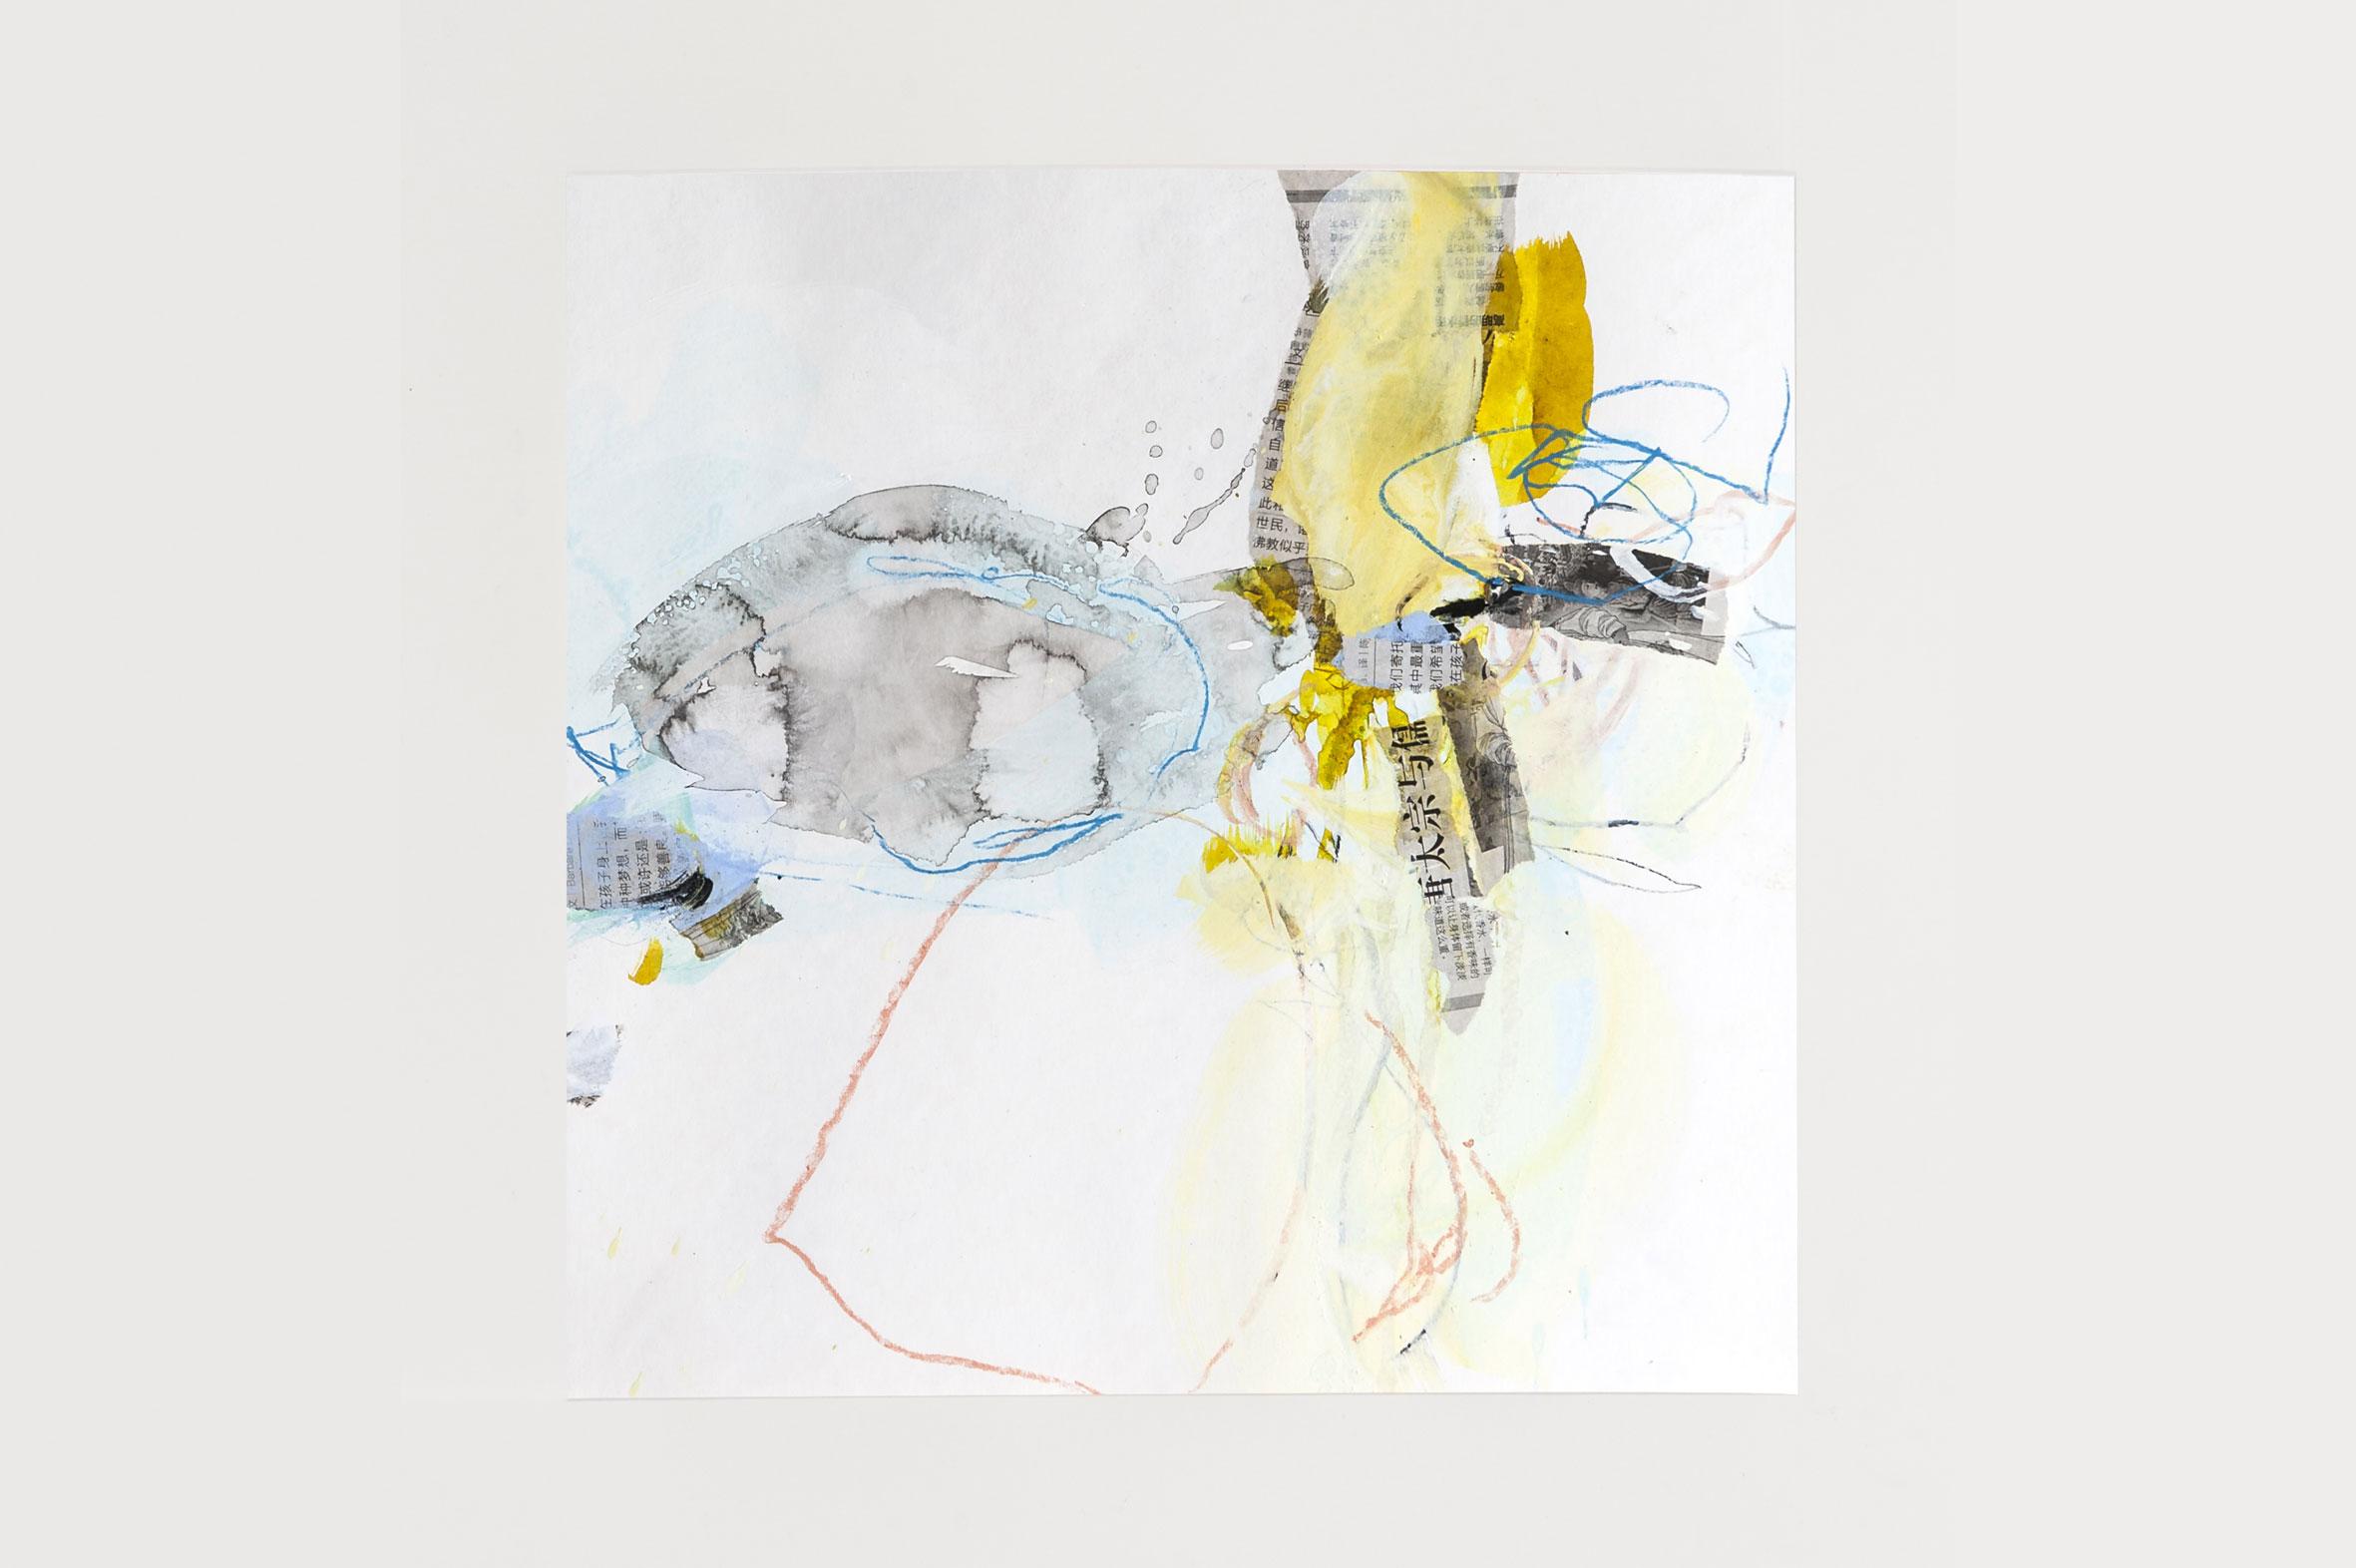 o.T., 40 cm x 40 cm, Mischtechnik auf Papier, 2017